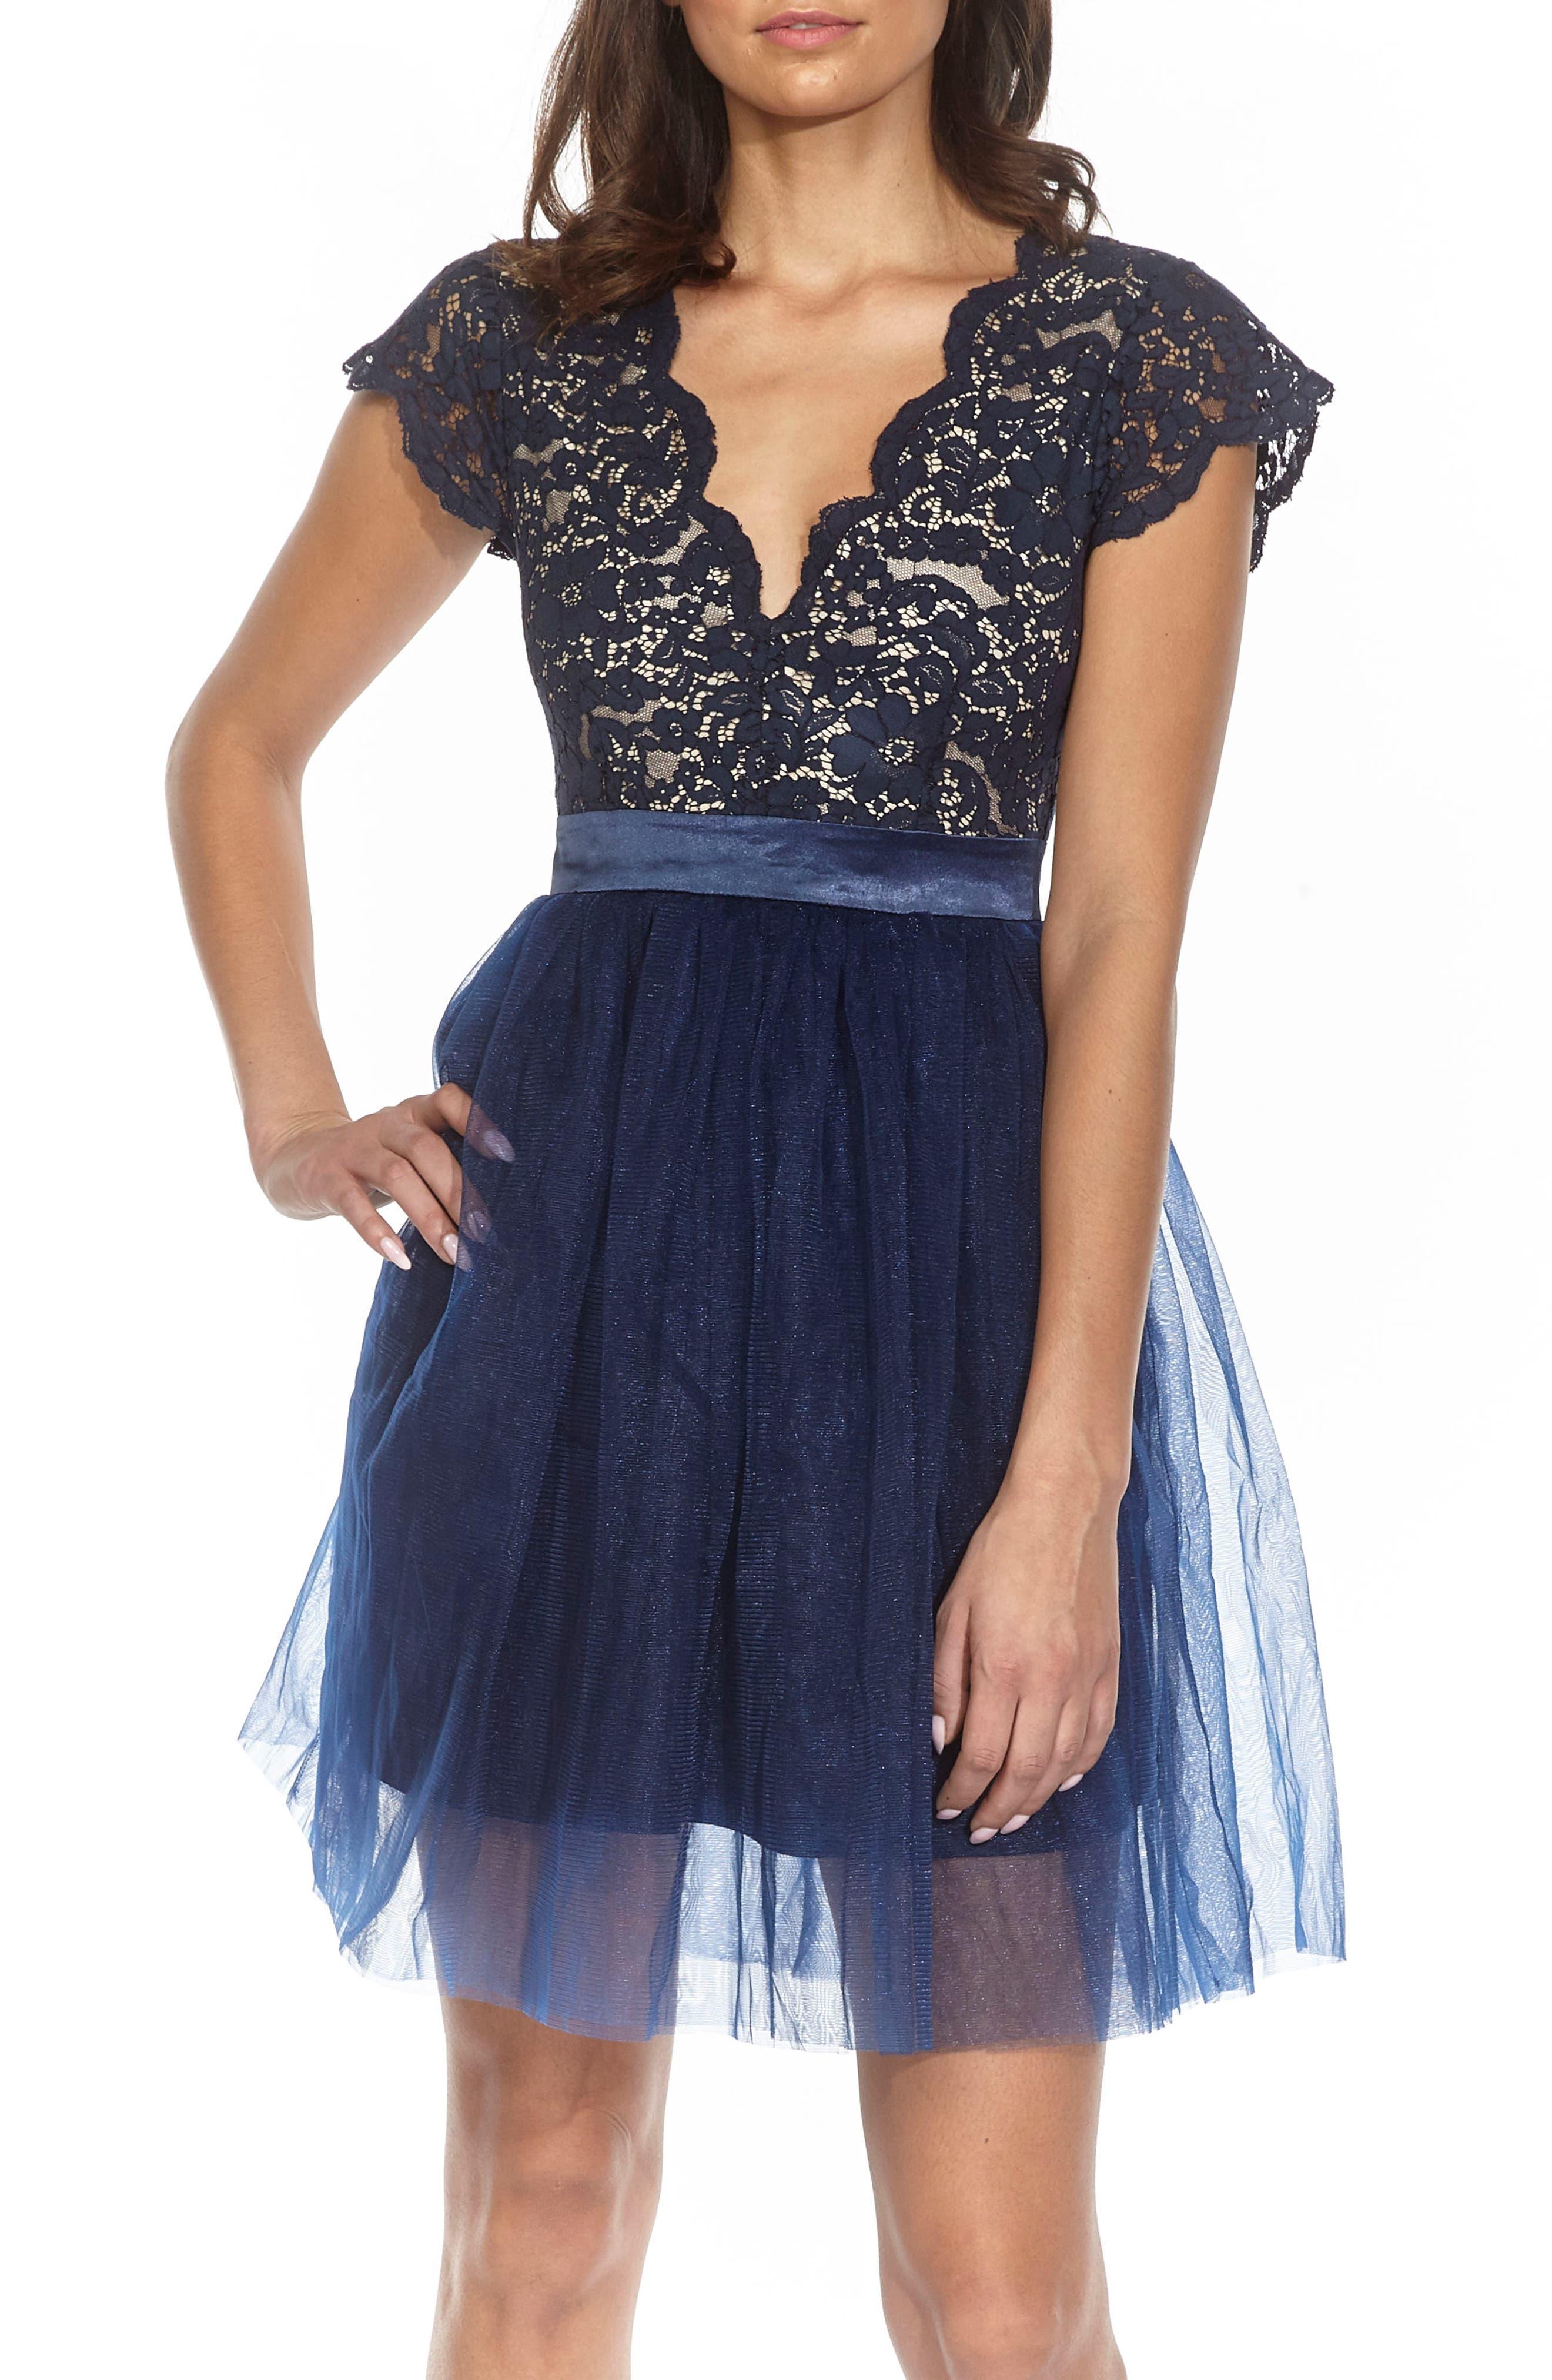 Macen Scalloped Lace Skater Dress,                             Alternate thumbnail 4, color,                             410